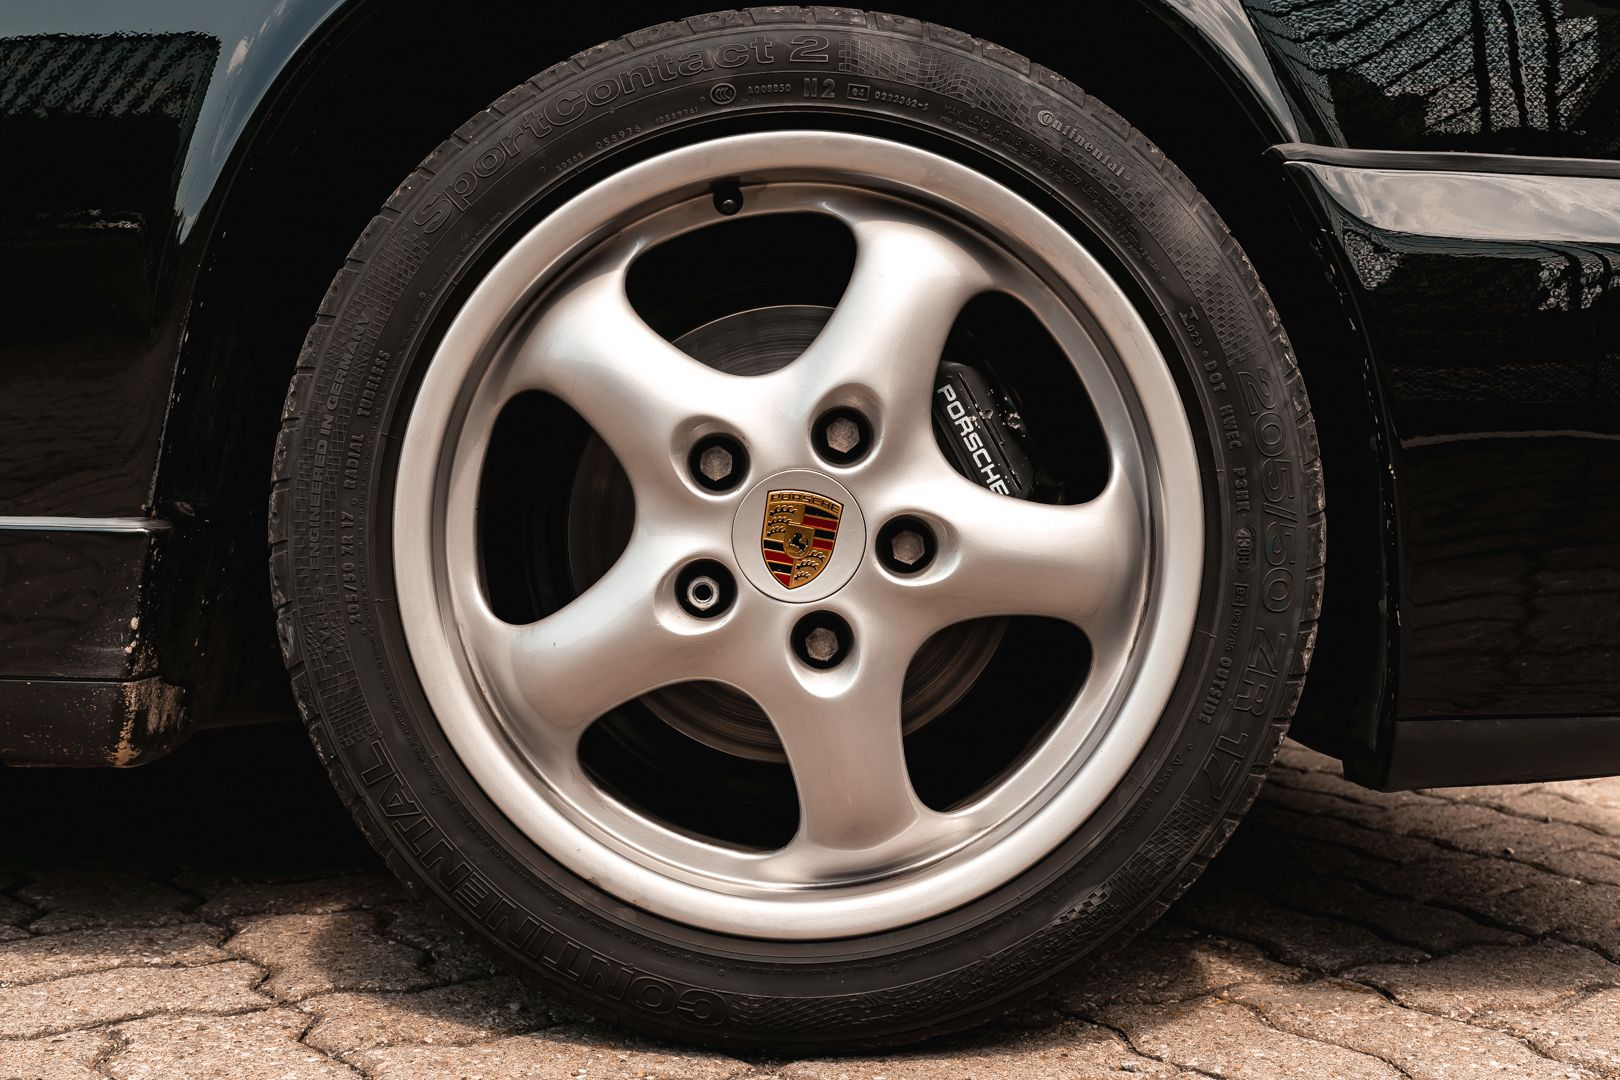 1991 Porsche 911/964 Carrera 4 79213